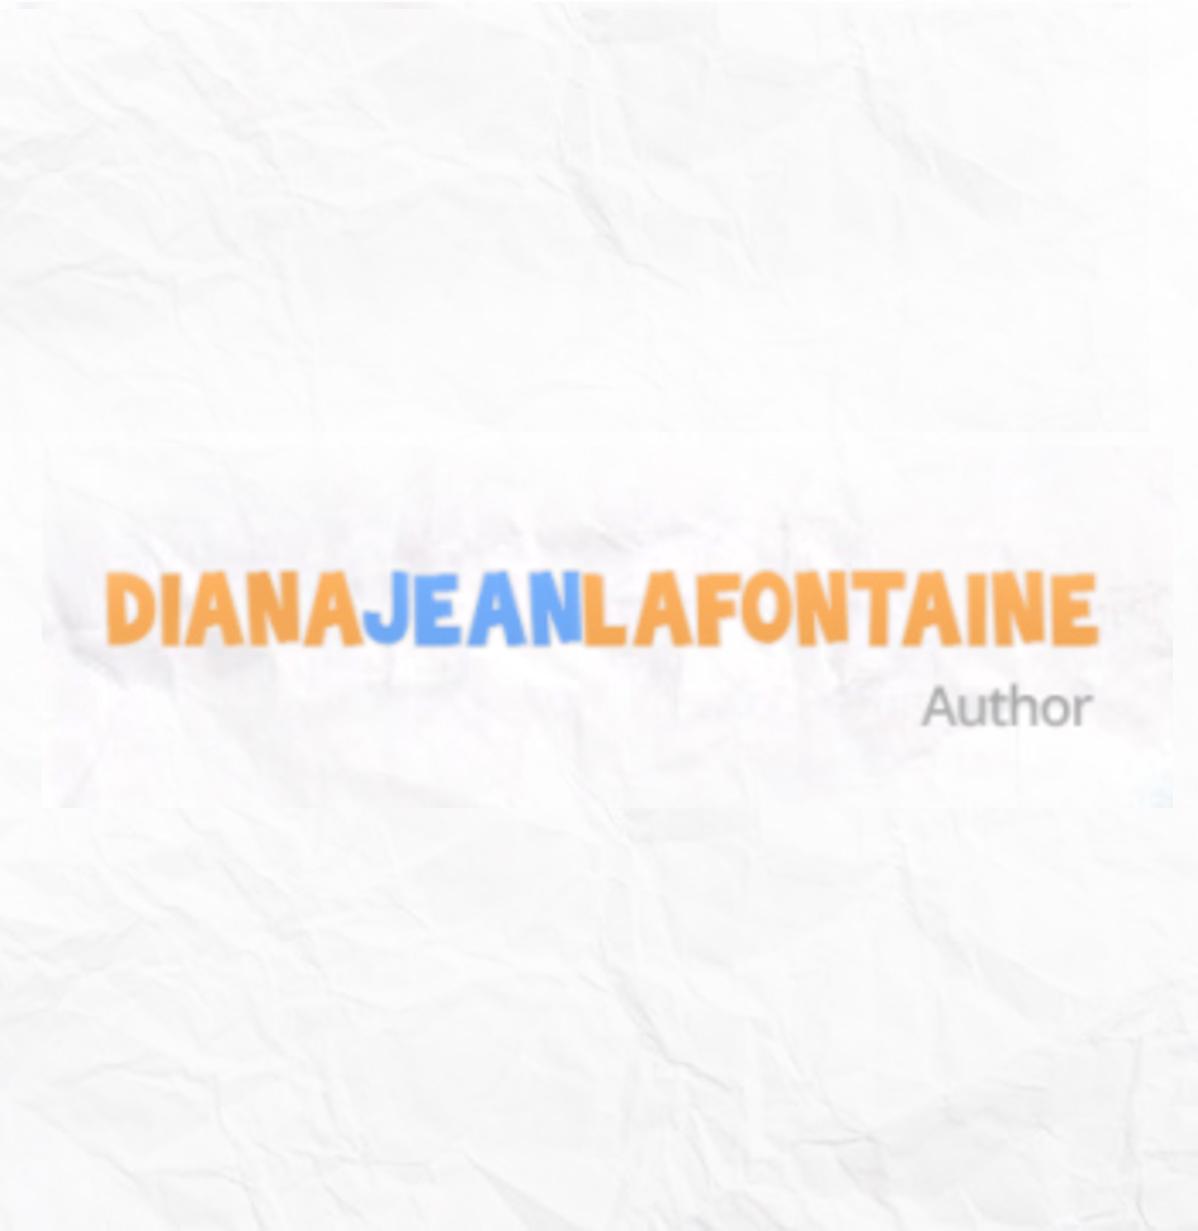 Diana Jean La Fontaine